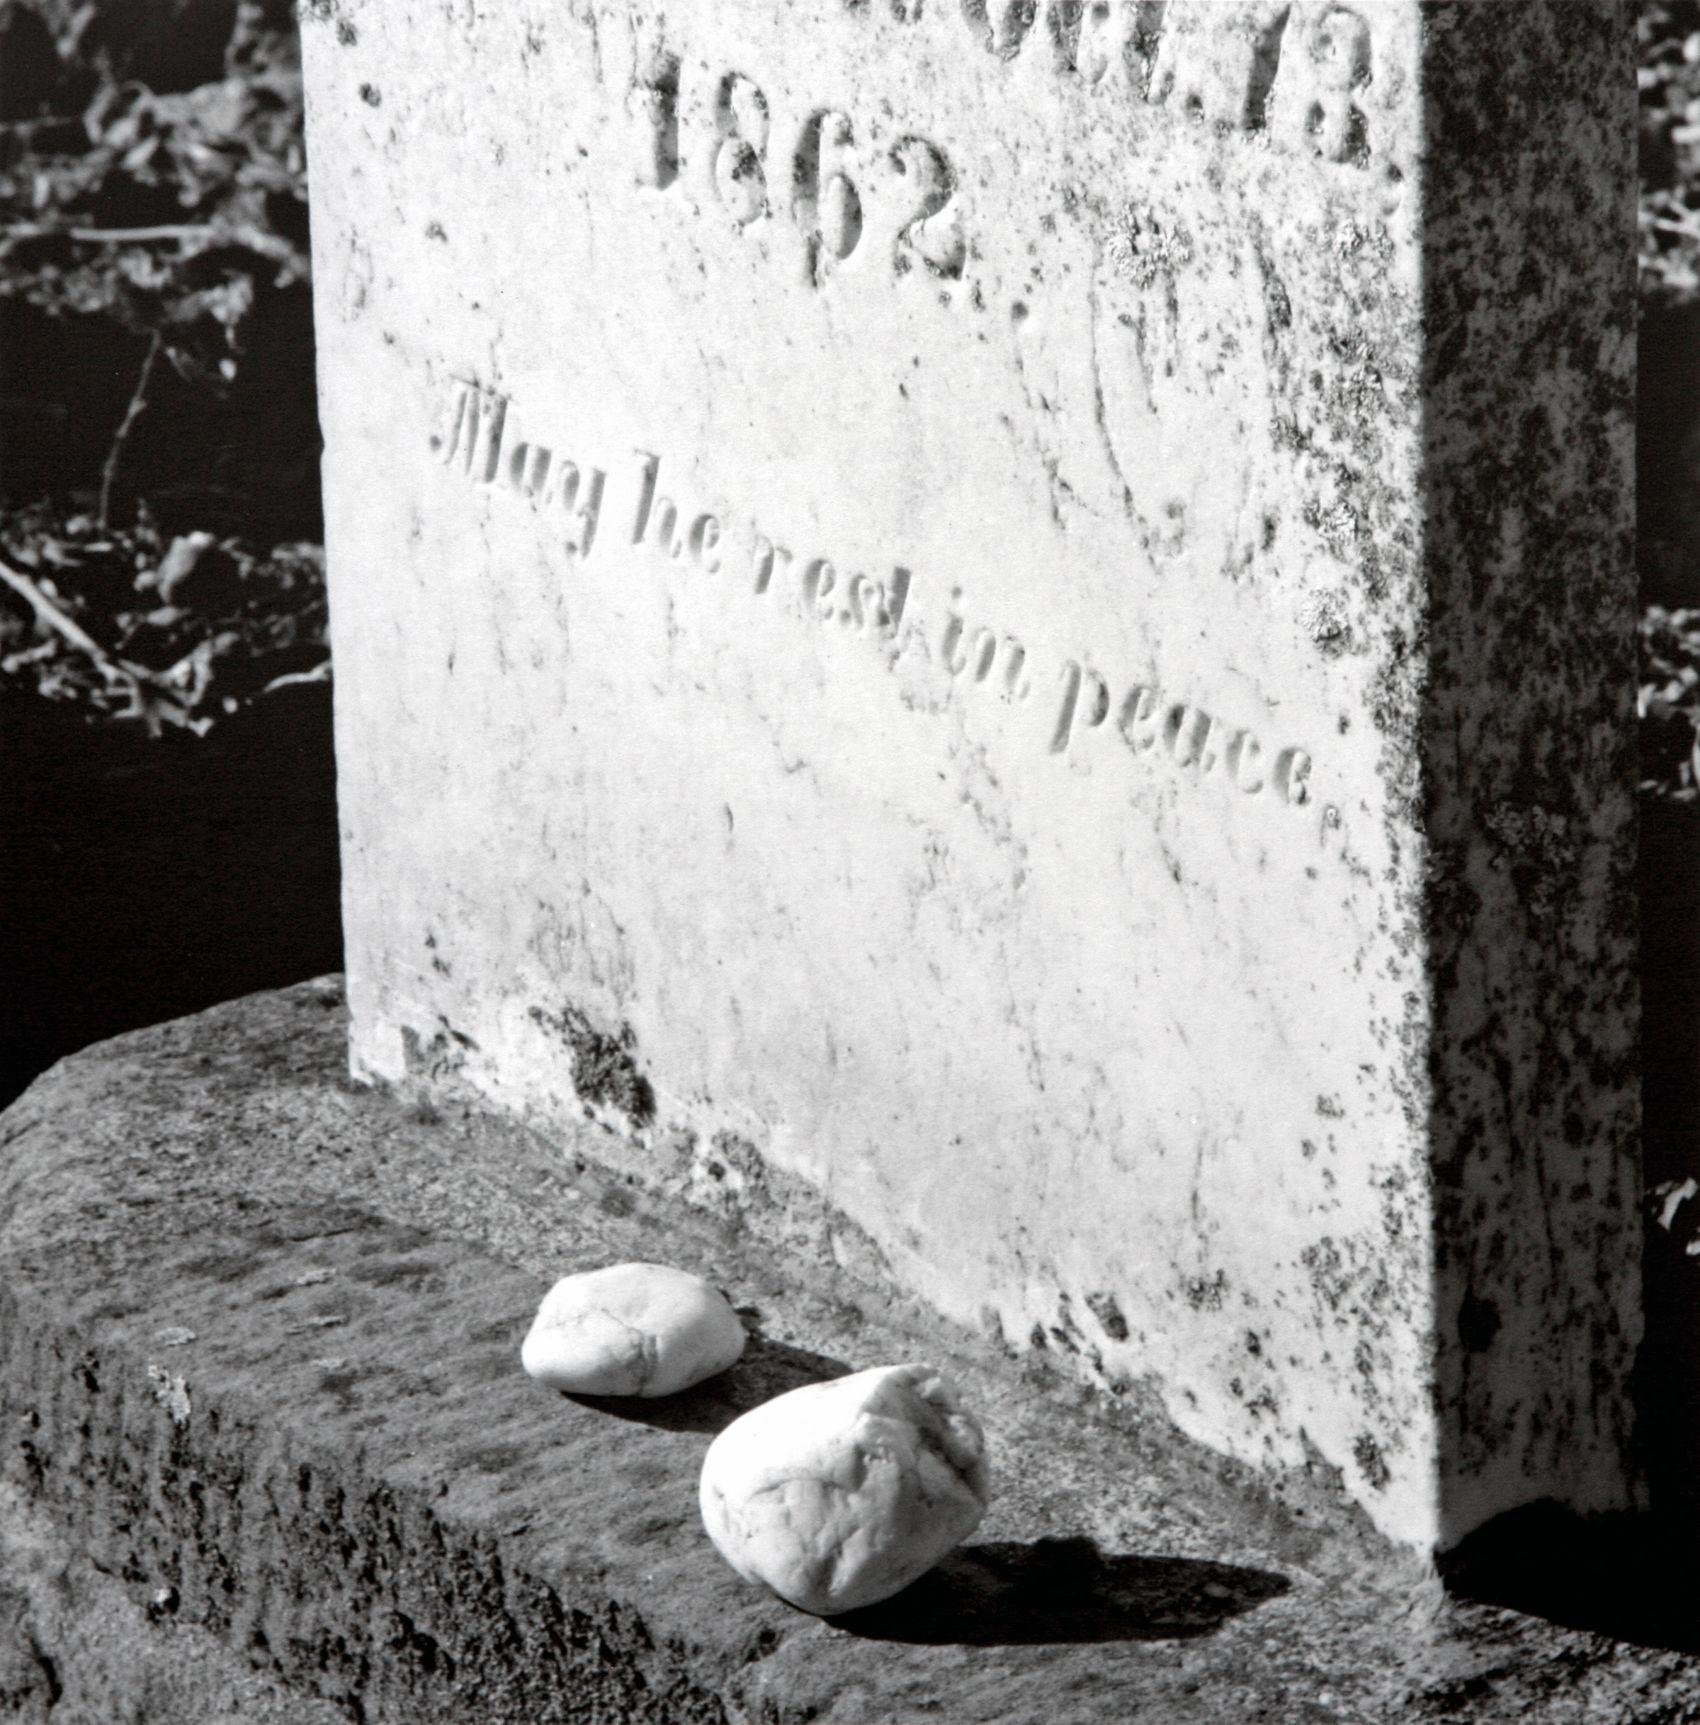 Remembrance Stones, Jewish Cemetery, Jackson, CA, 2006